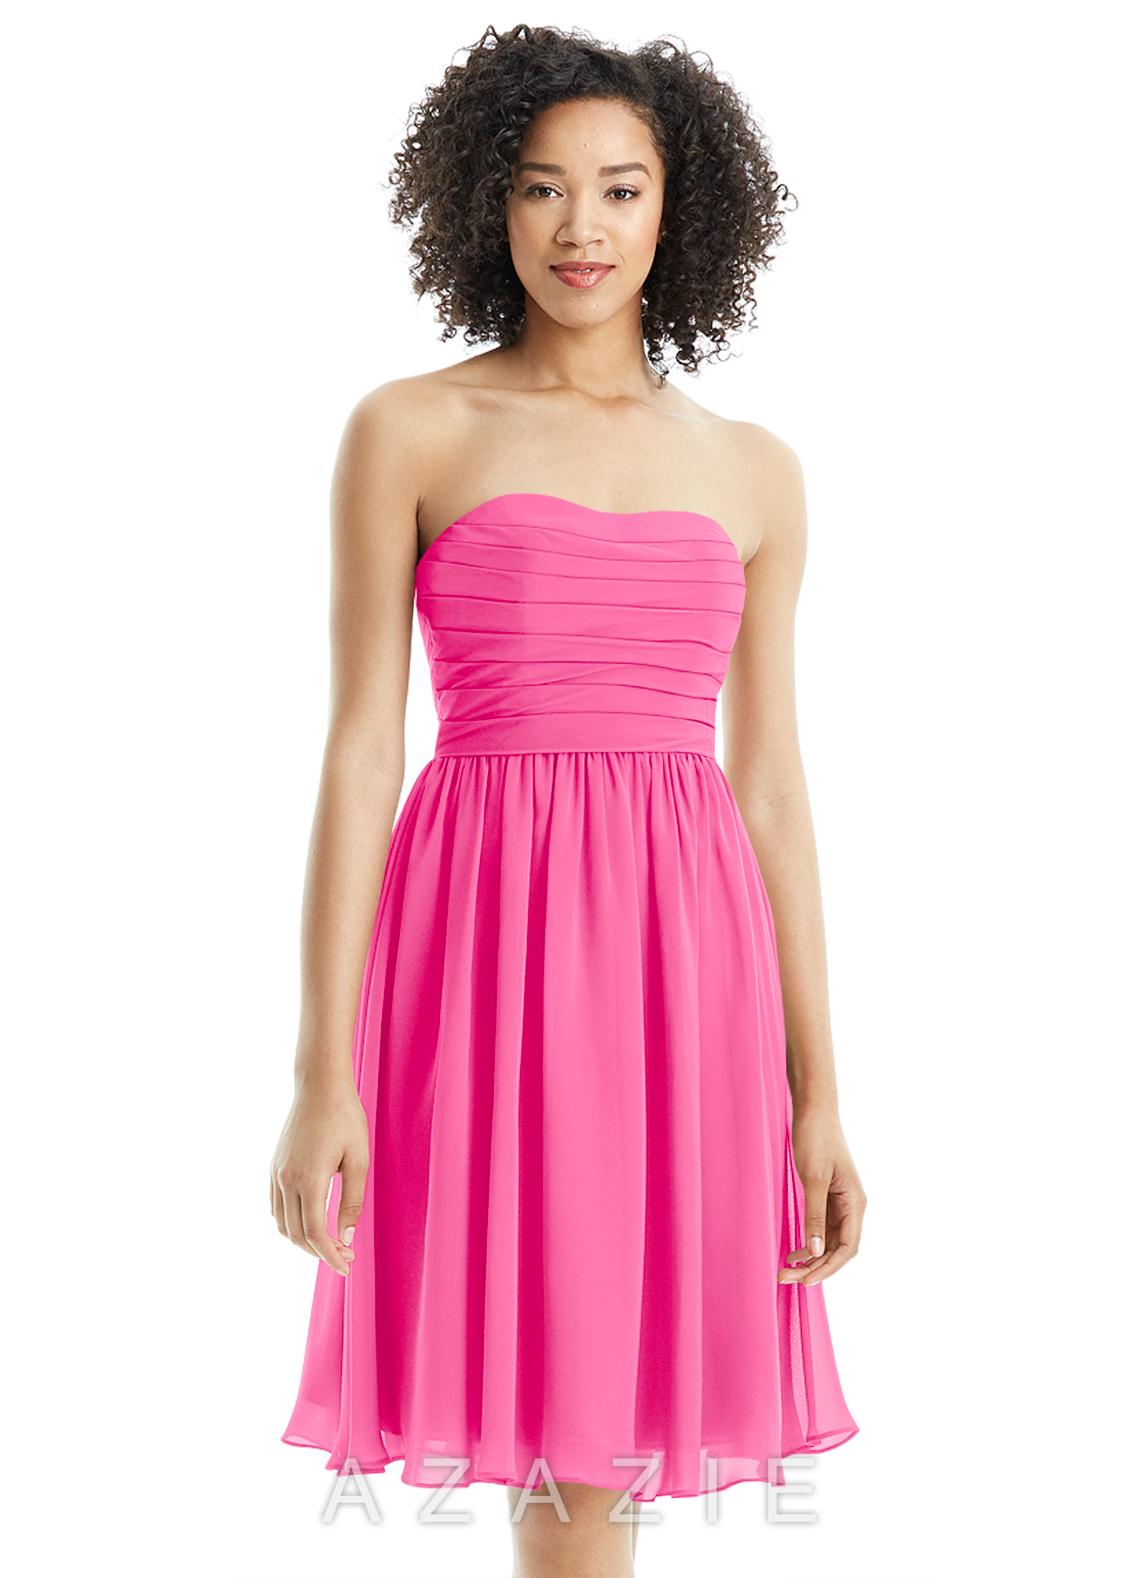 15dbe3d0921 Azazie Kaiya Bridesmaid Dress